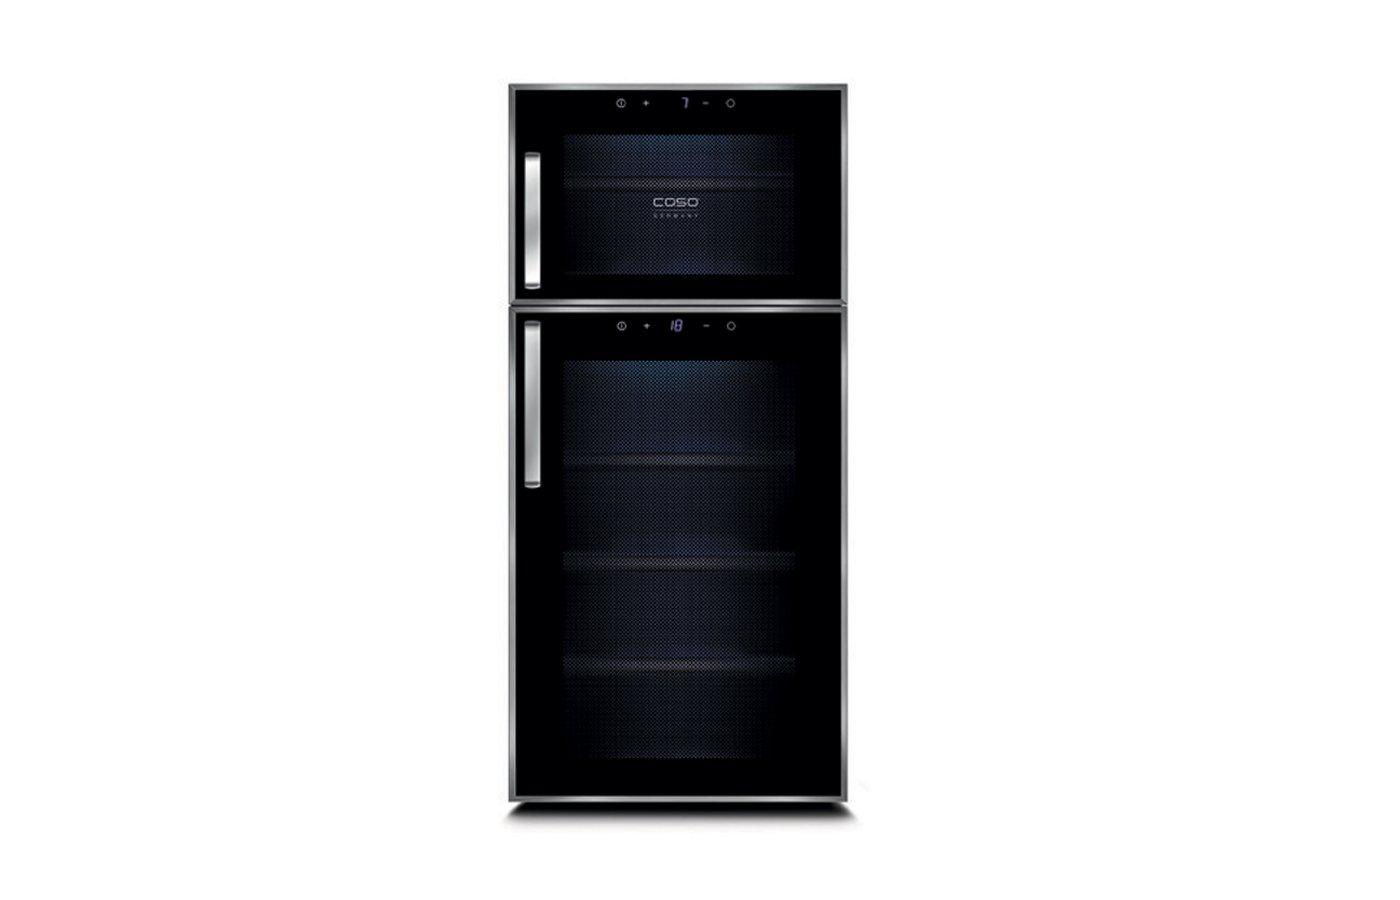 Холодильник CASO WineDuett Touch 21